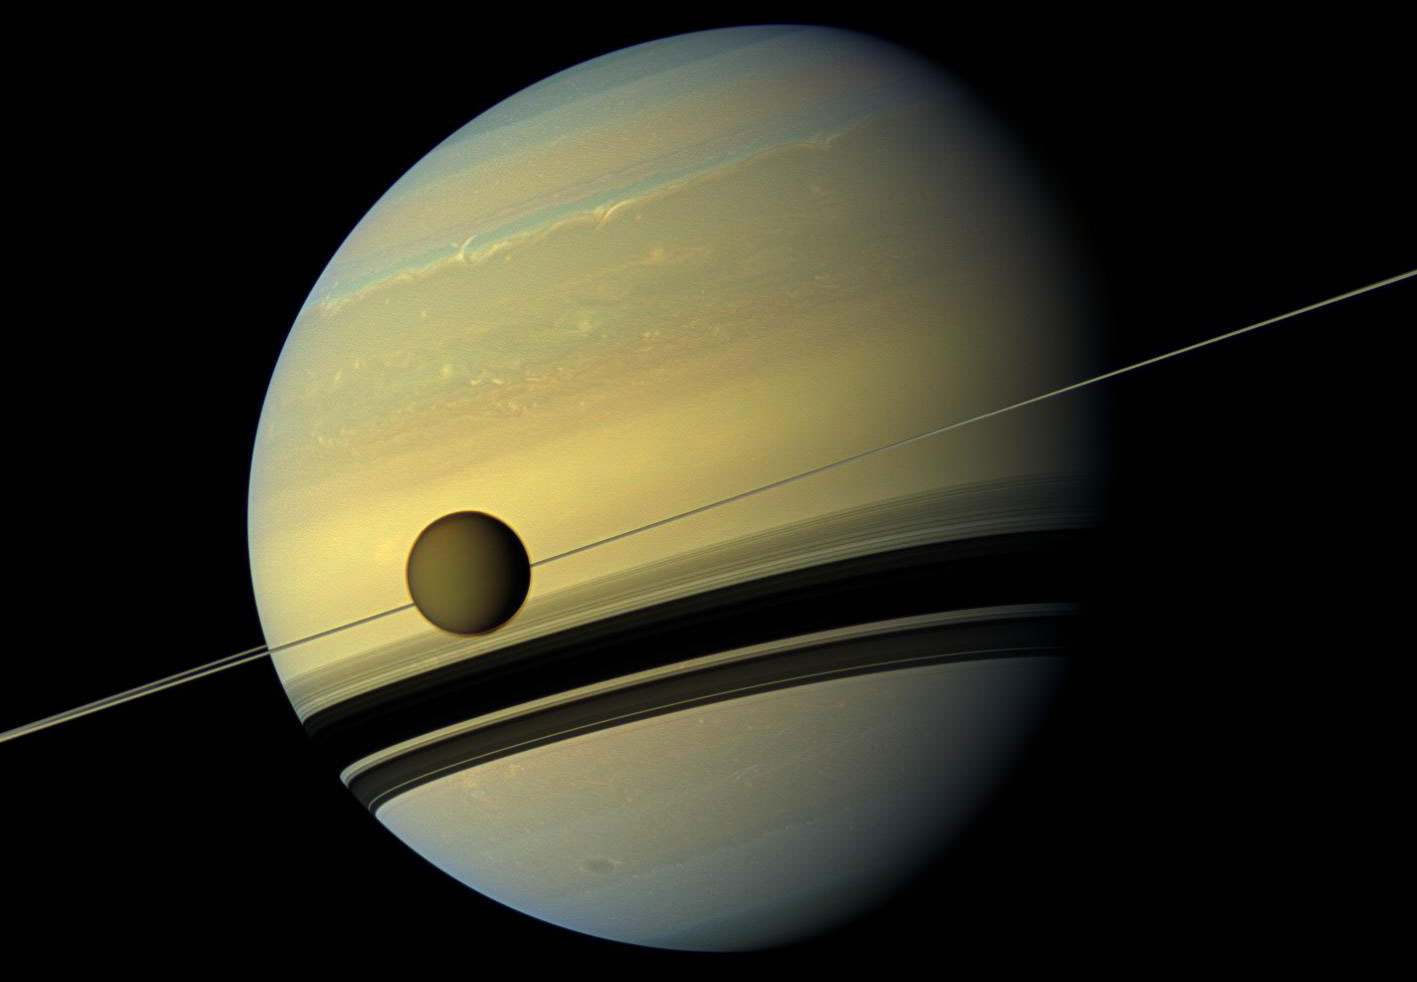 Titán, Saturno